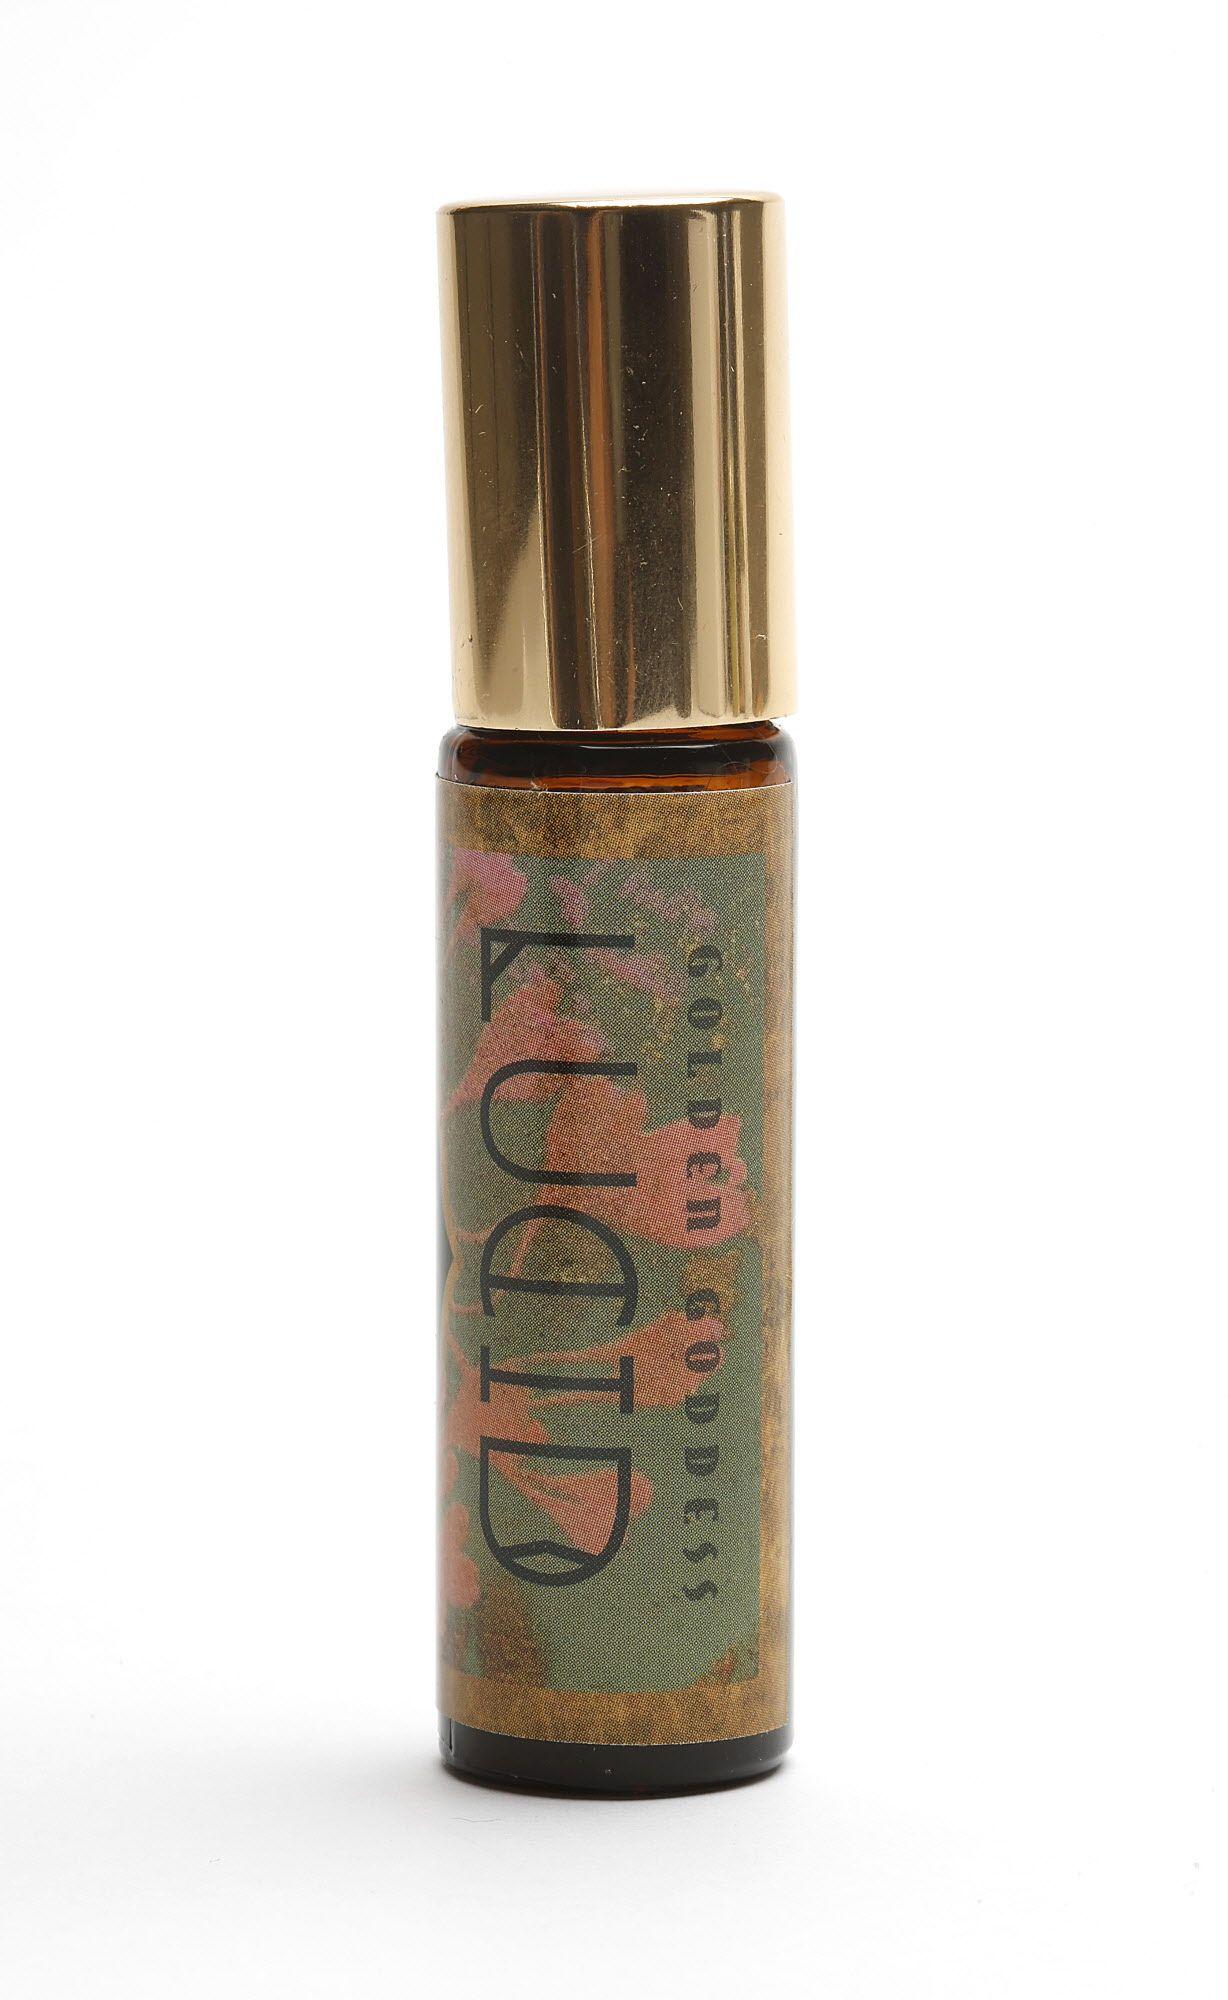 Golden Goddess Lucid perfume, an aromatherapy blend--bright, vibrant, joyful-- on Wednesday, June 7, 2017, in San Francisco, Calif.